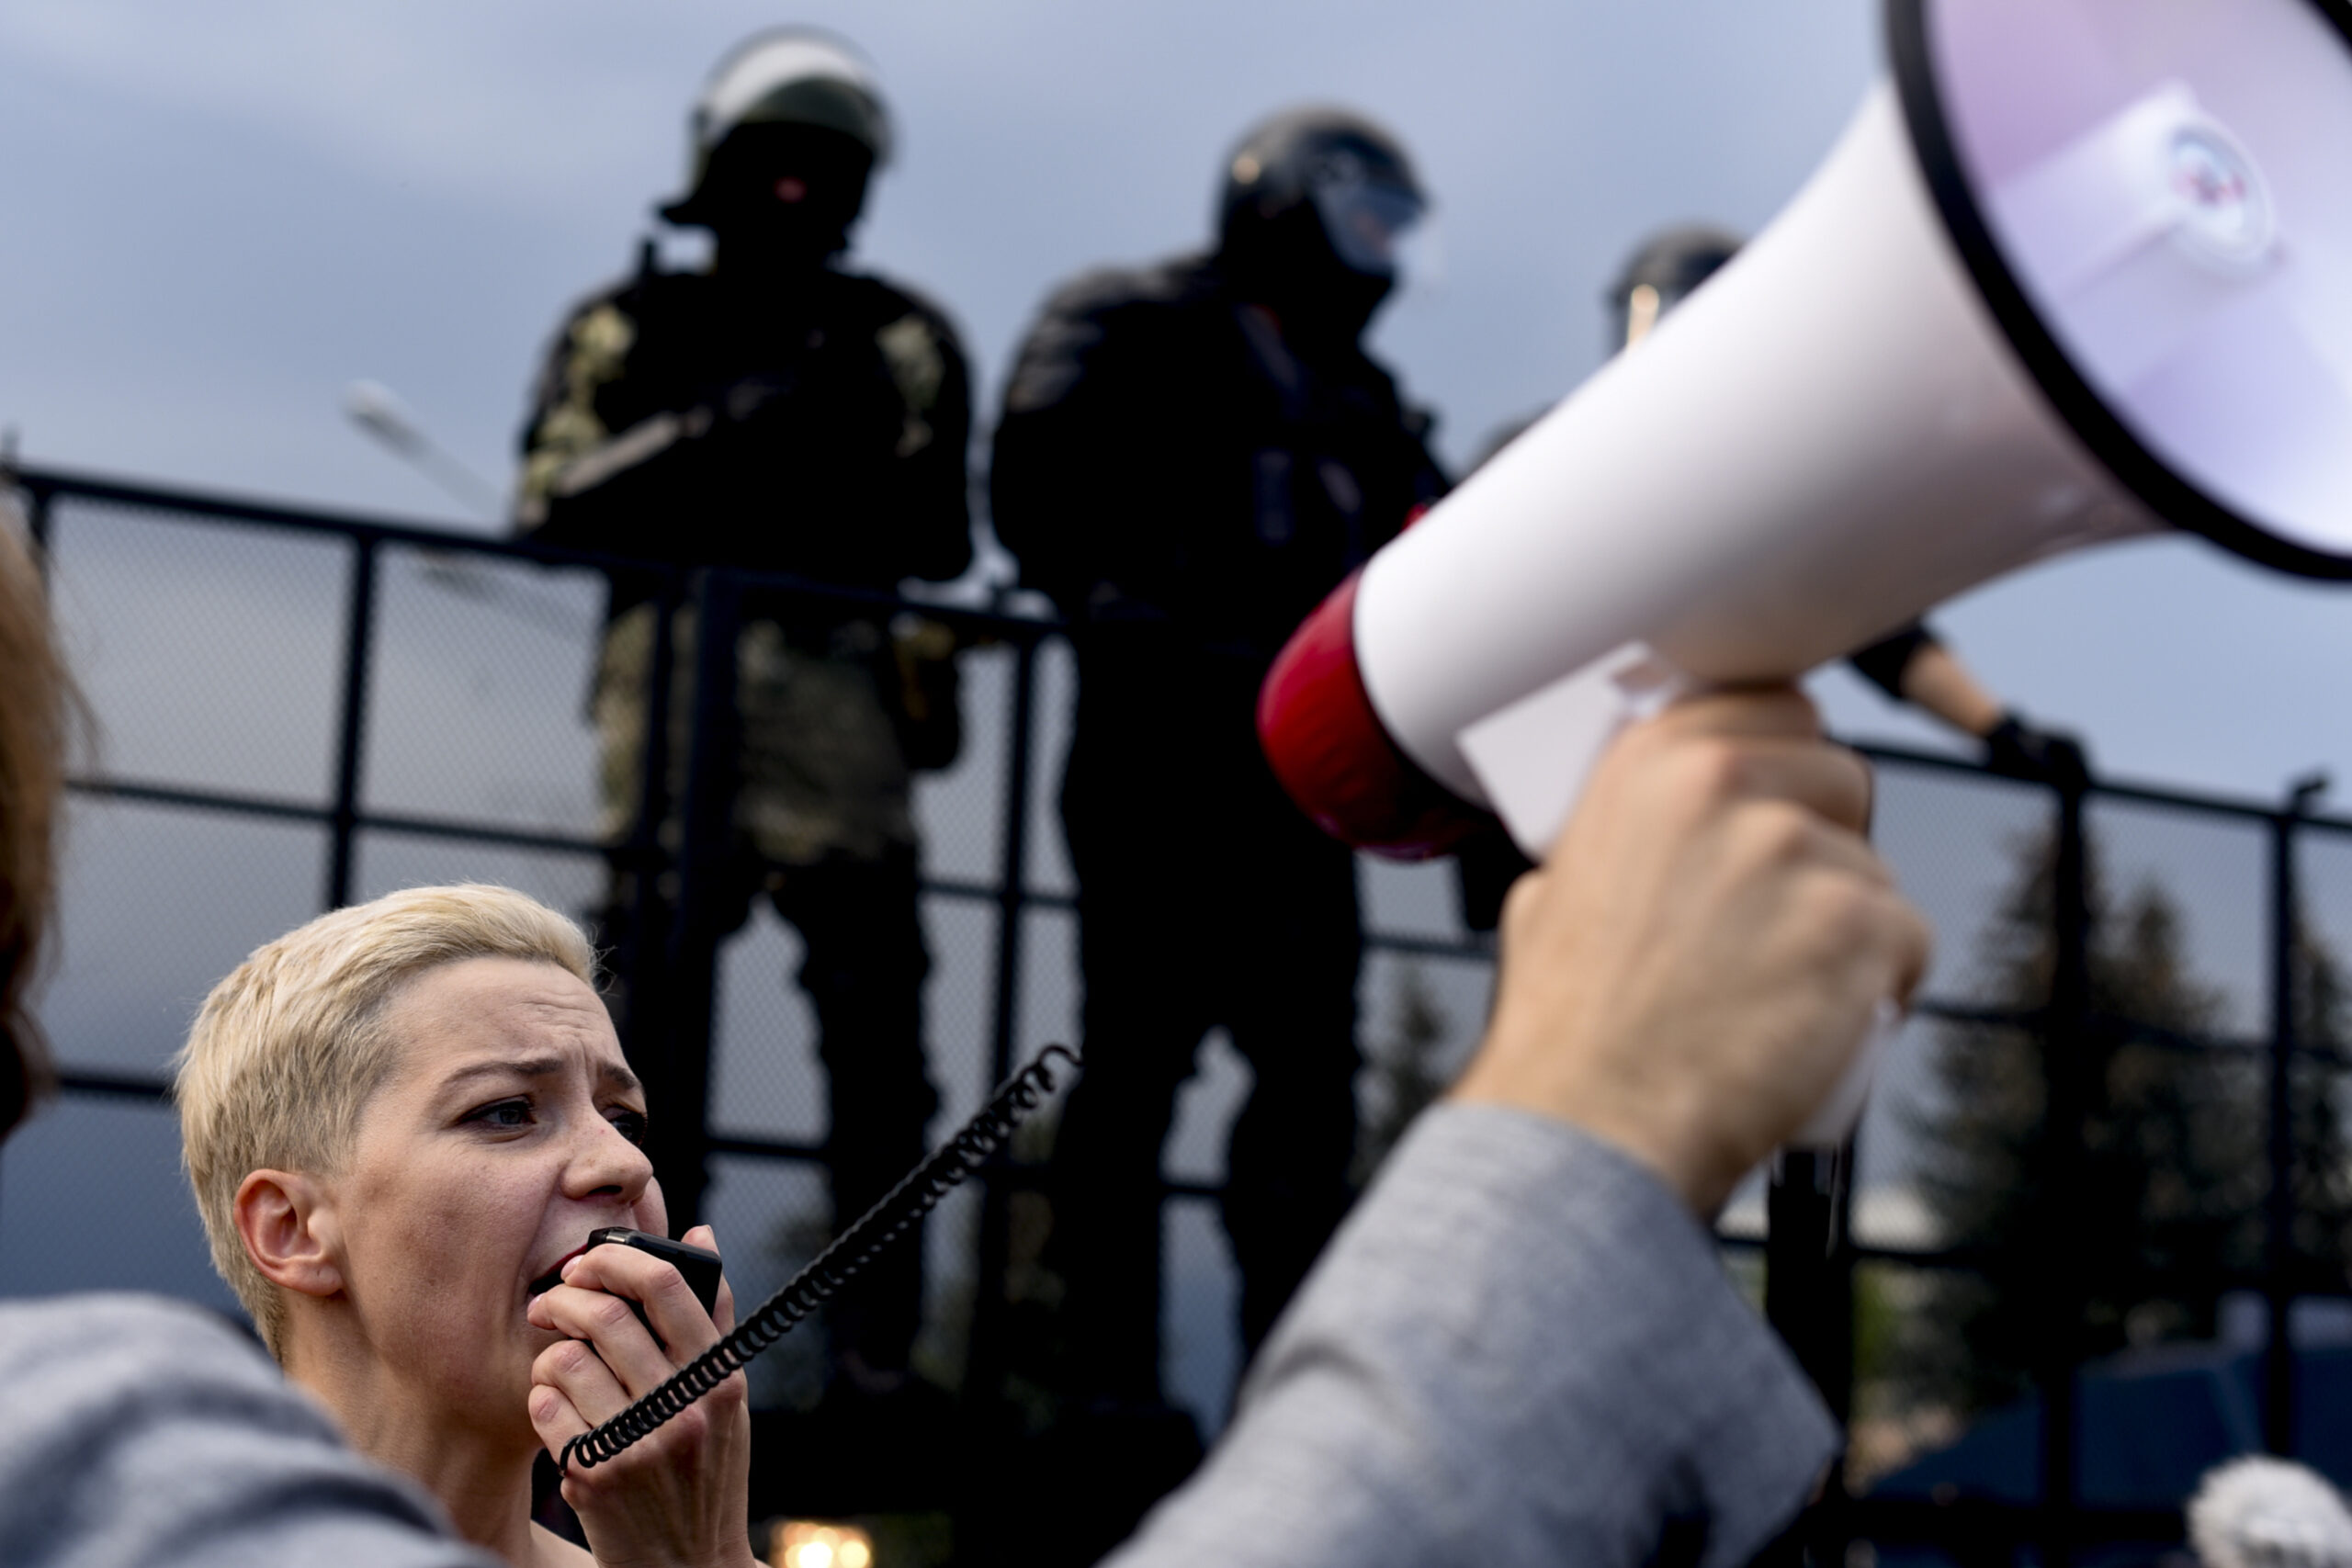 Urgent Action: Belarus – Free opposition leader Maryia Kalesnikava